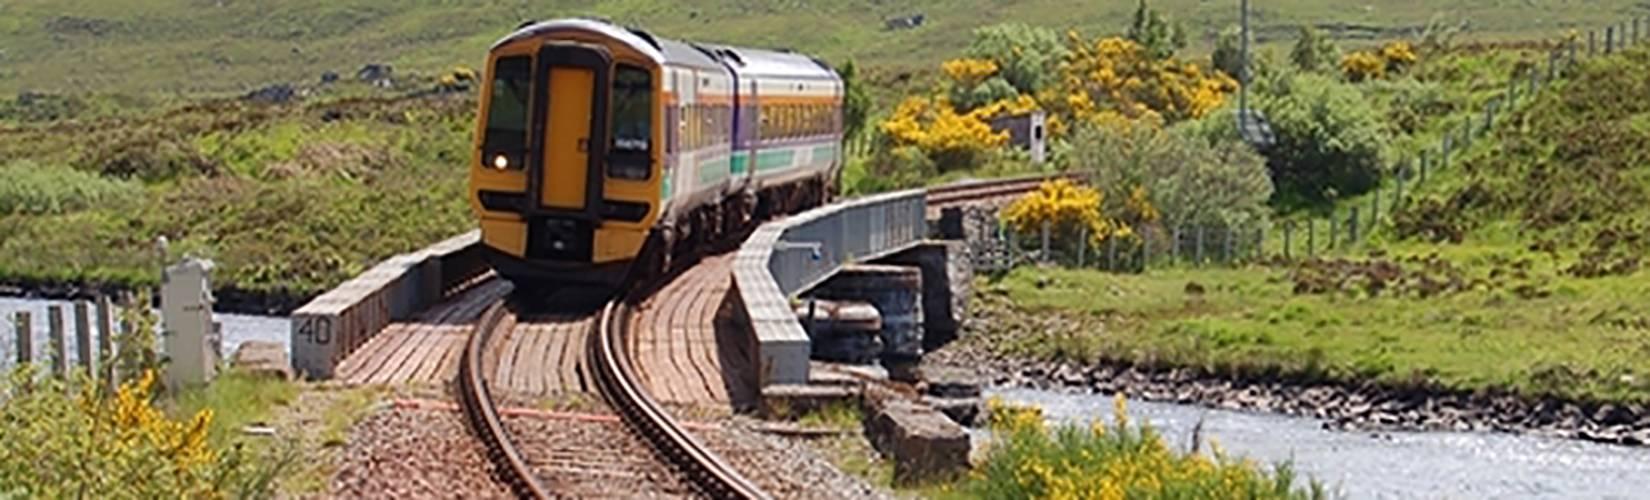 train_blog_snippet